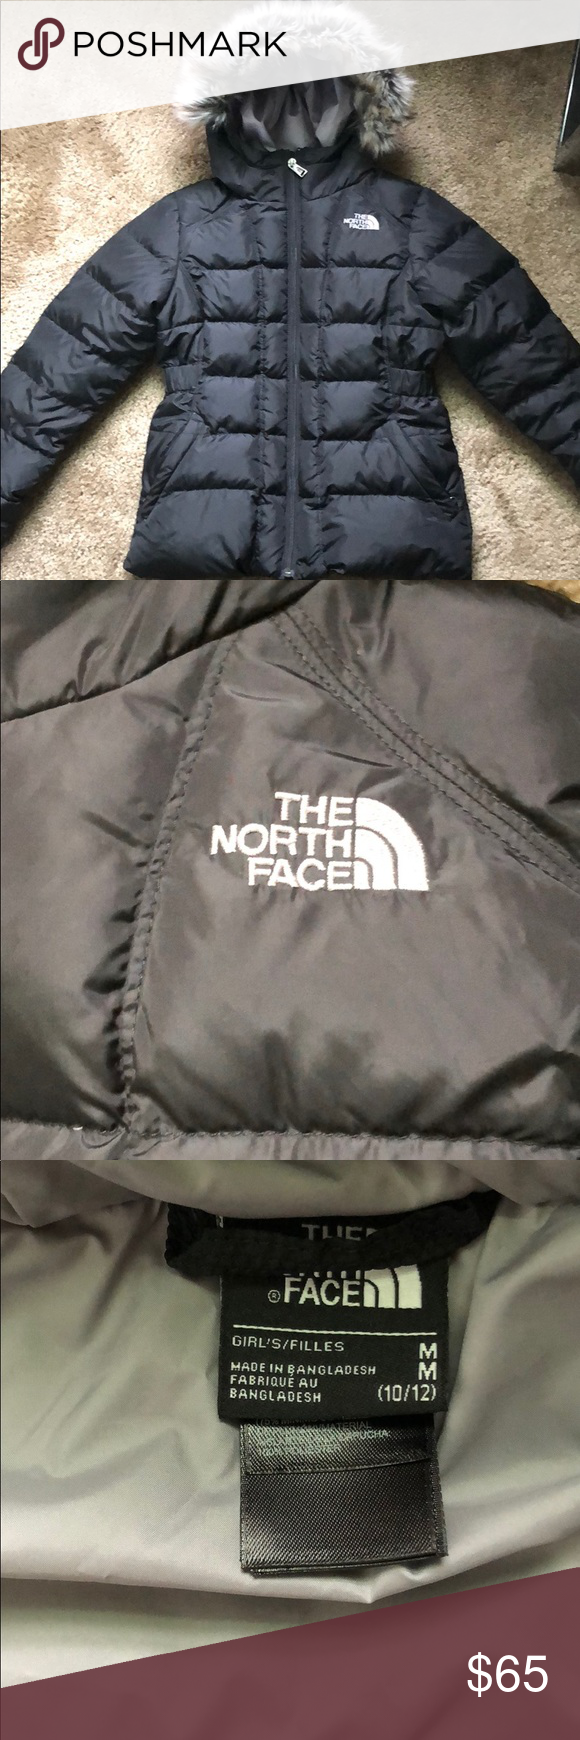 Nwot Girls North Face Jacket Size 10 12 Girls North Face Jacket North Face Jacket North Face Girls [ 1740 x 580 Pixel ]